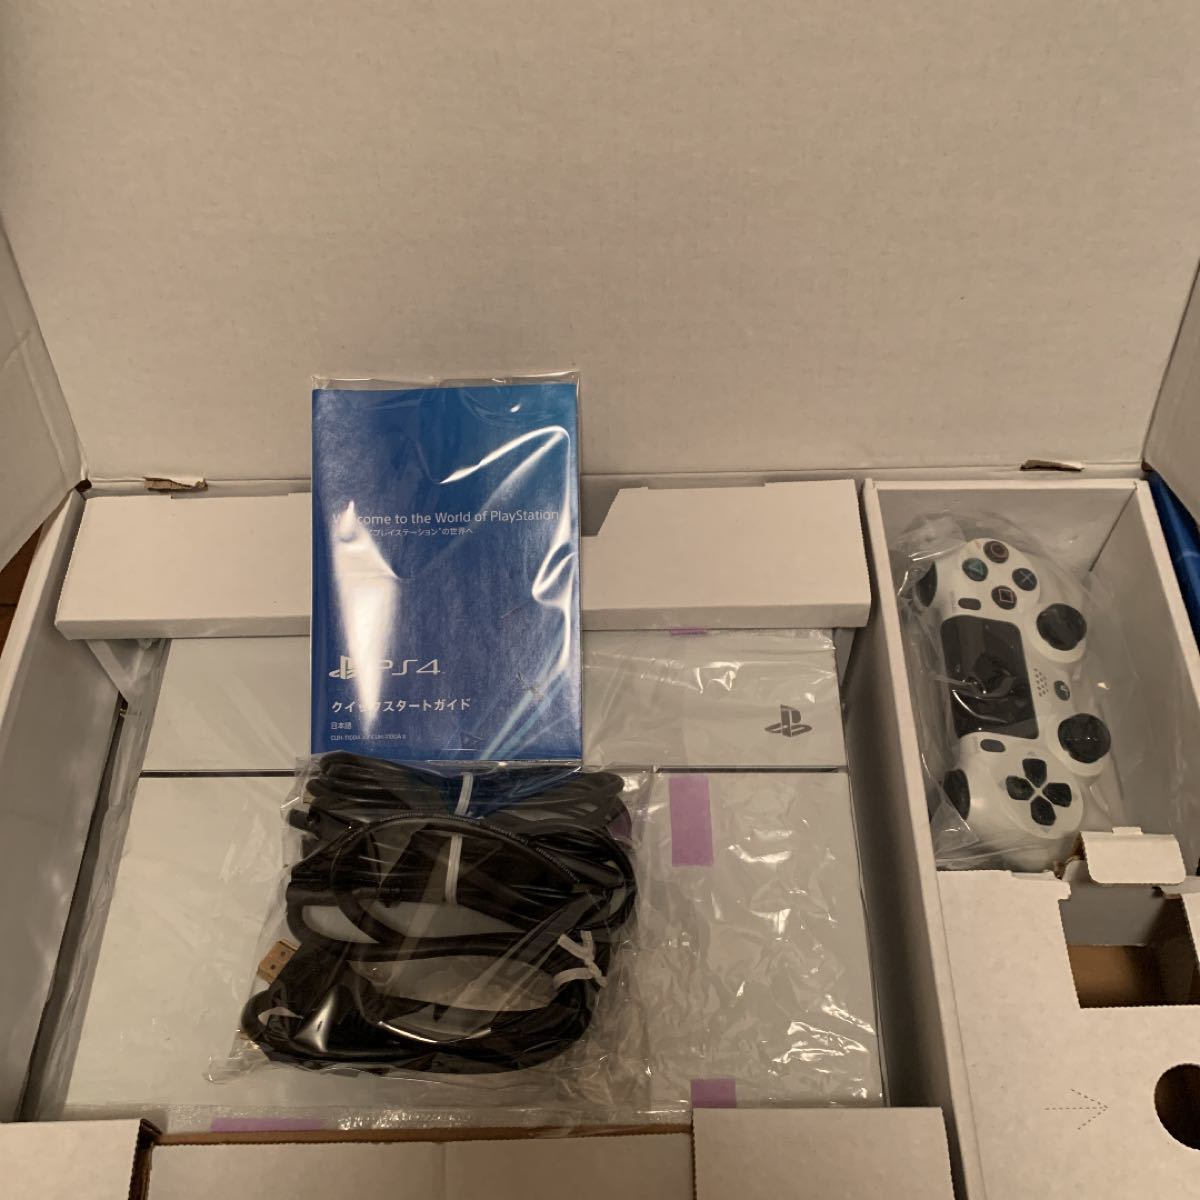 PS4本体 SONY プレステ4 プレイステーション4 グレイシャー ホワイト